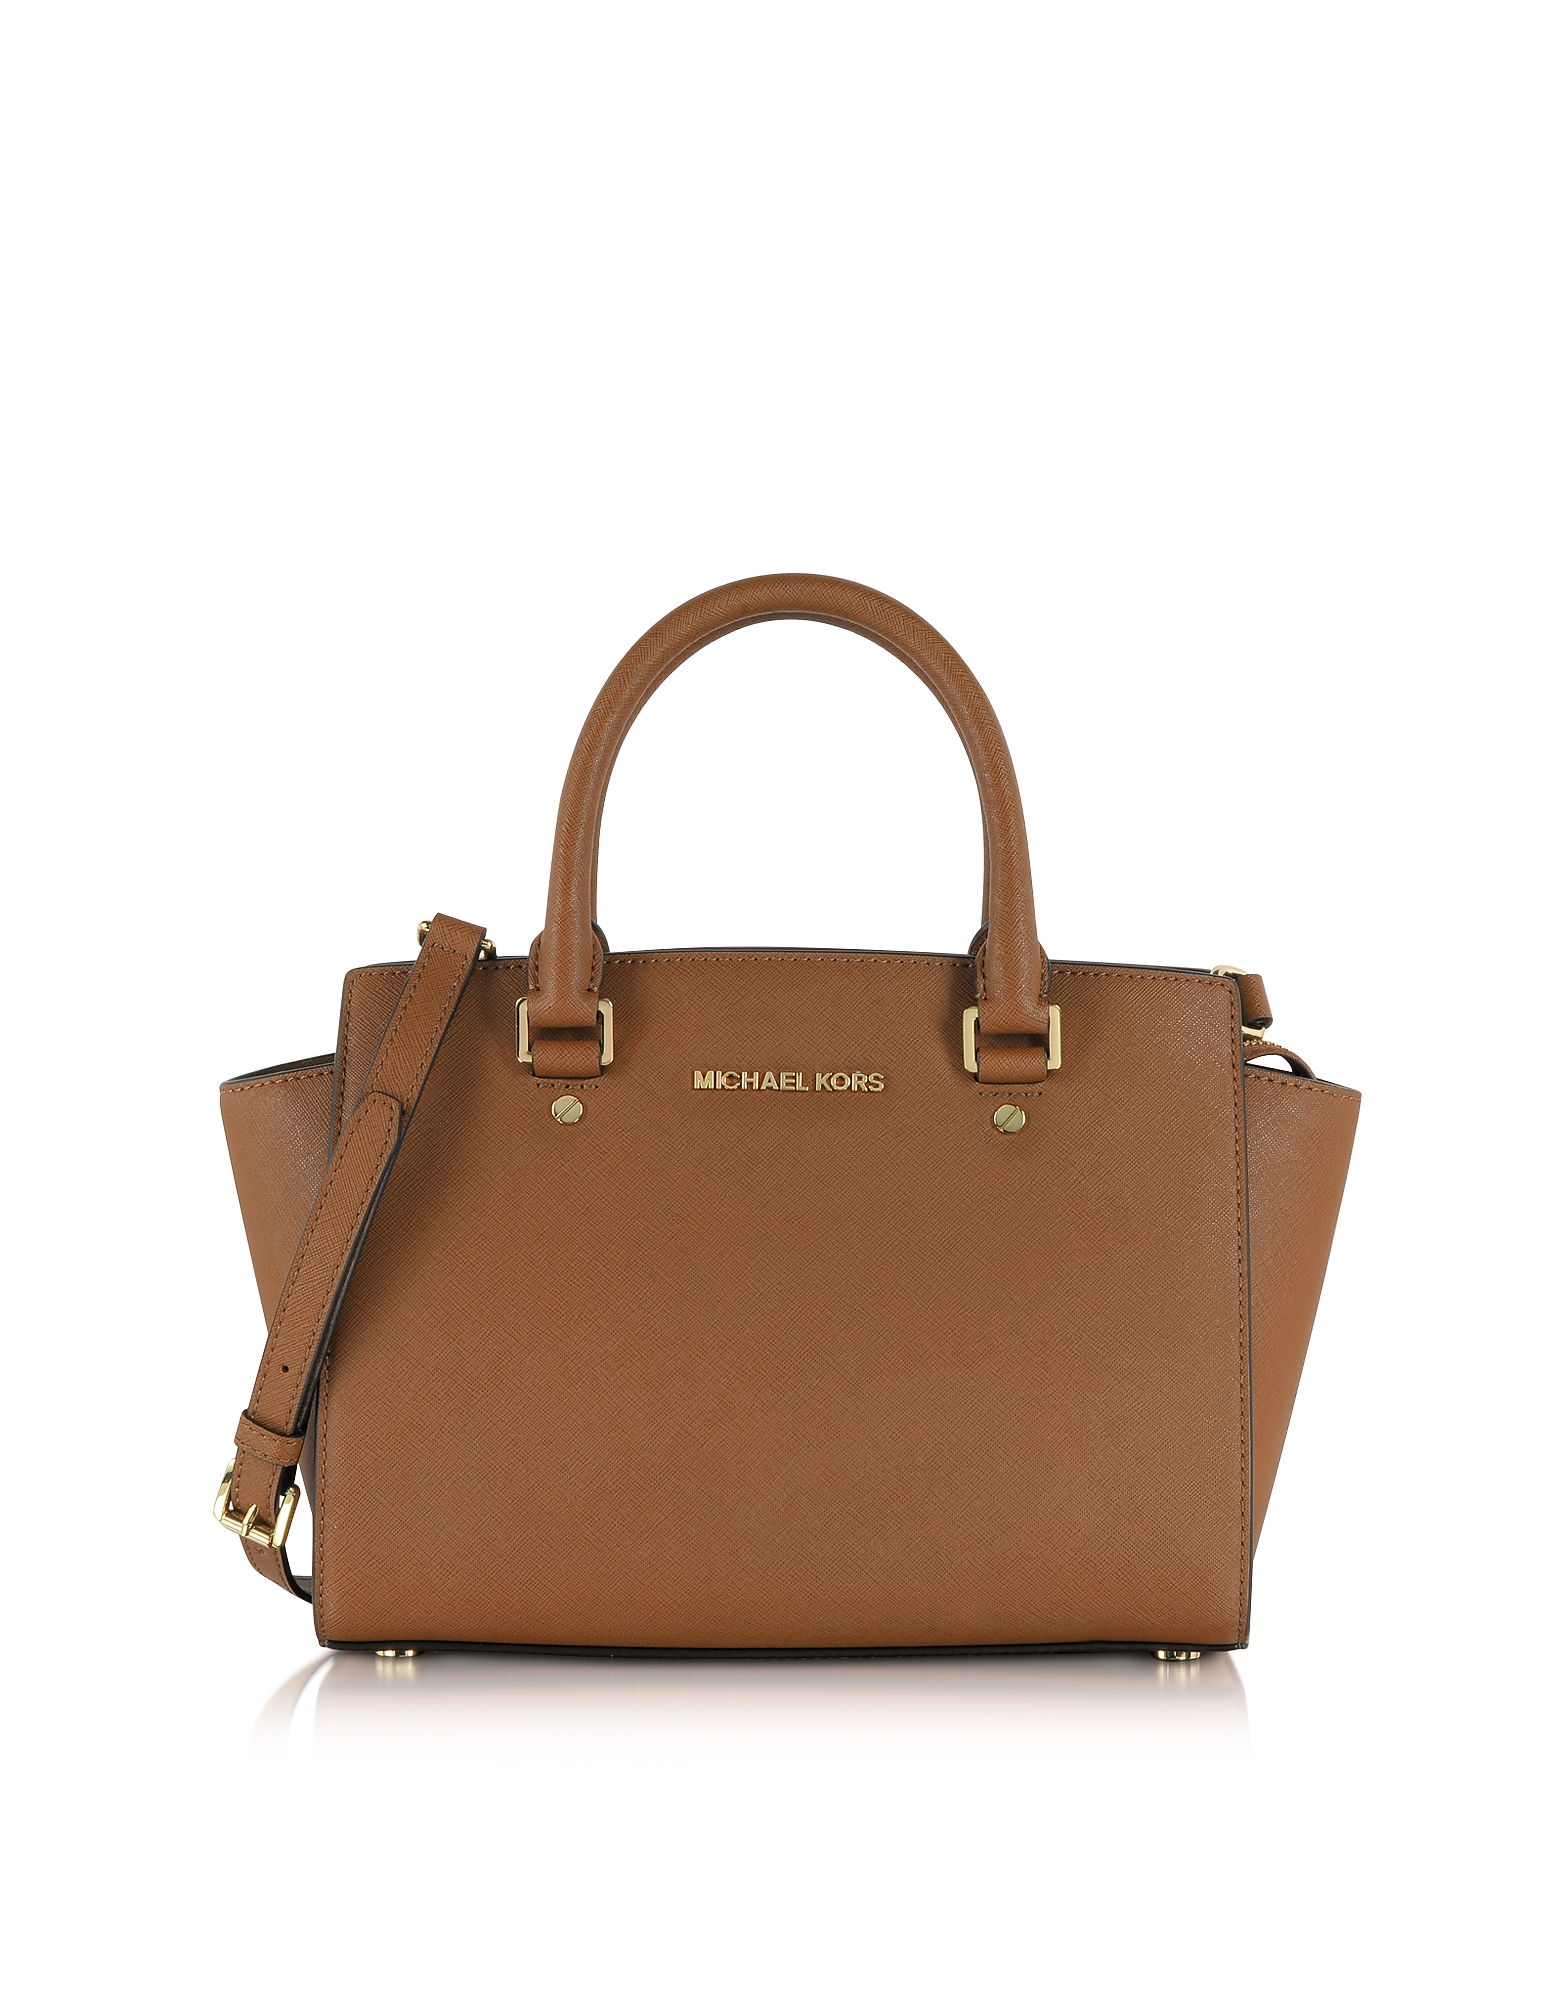 Michael Kors Handbags, Selma Medium Luggage Saffiano Leather Top-Zip Satchel Bag